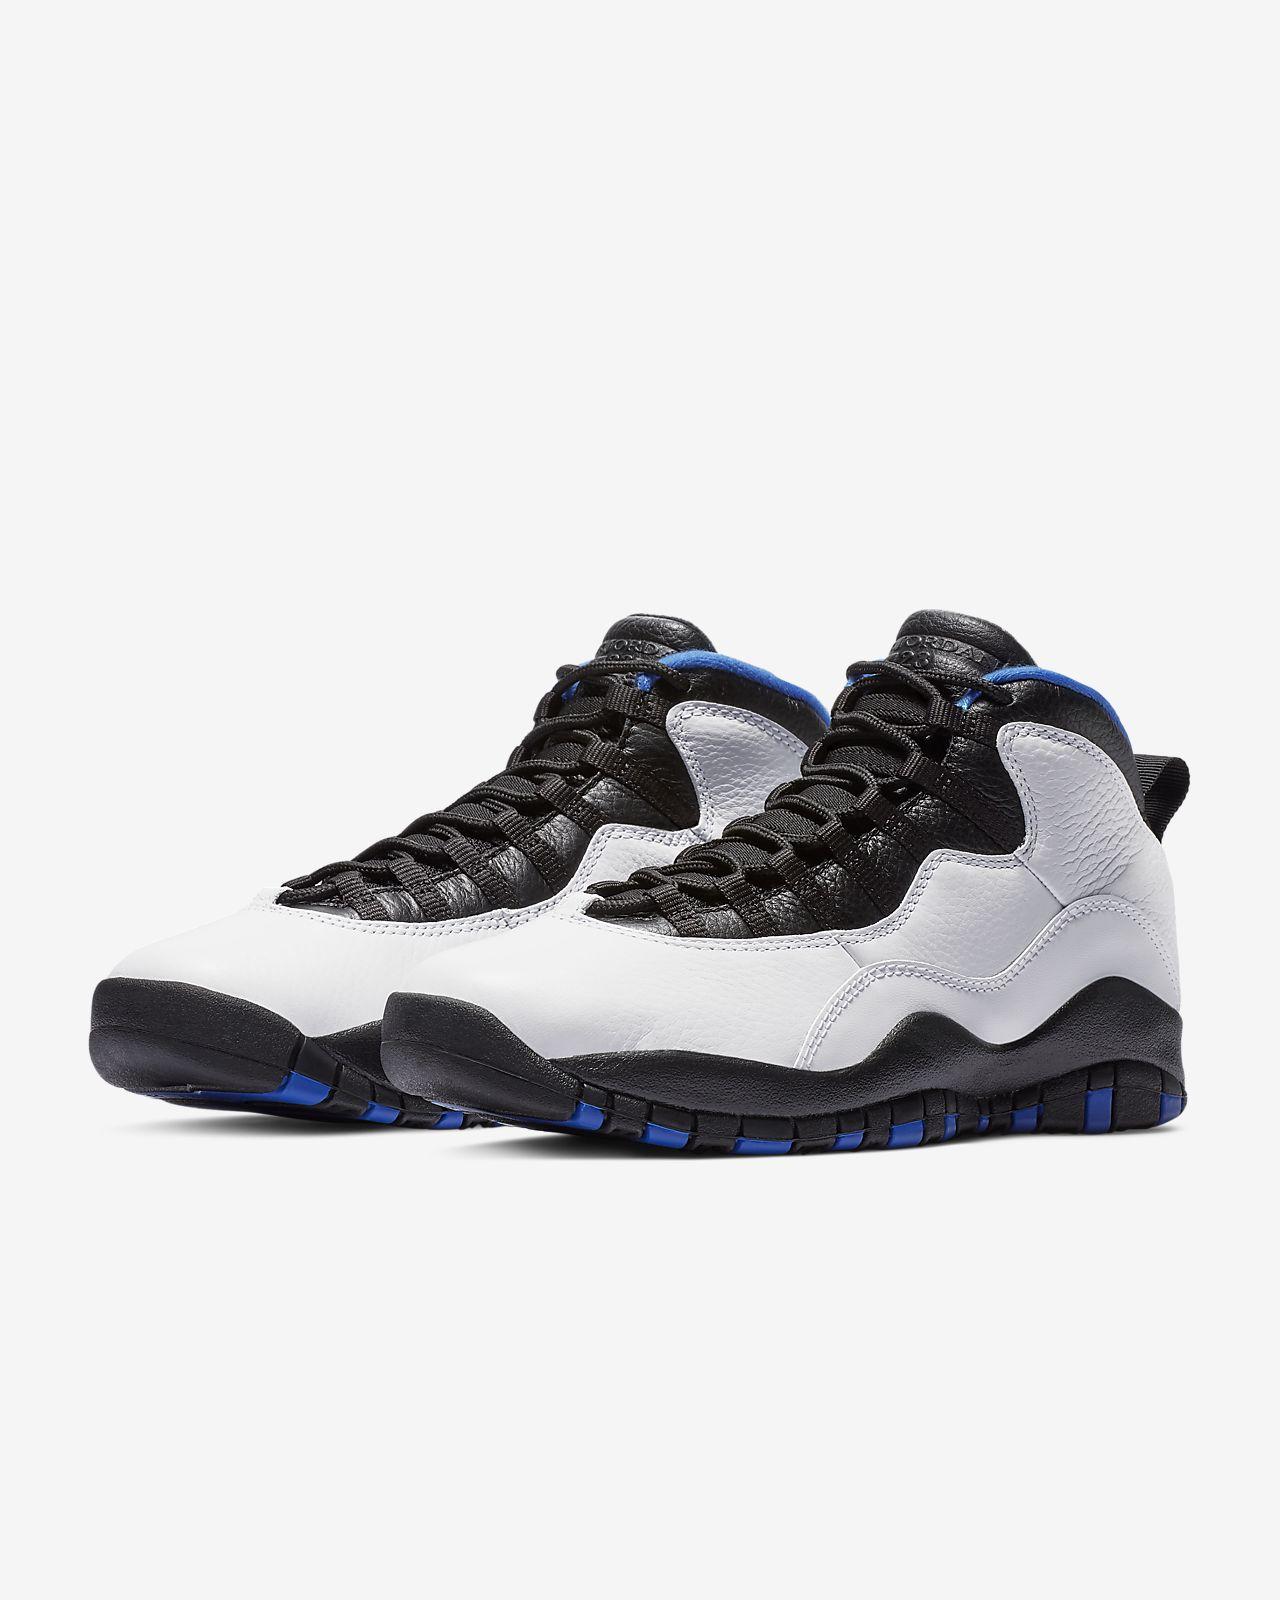 927bce58ac8a48 Air Jordan 10 Retro Men s Shoe. Nike.com DK